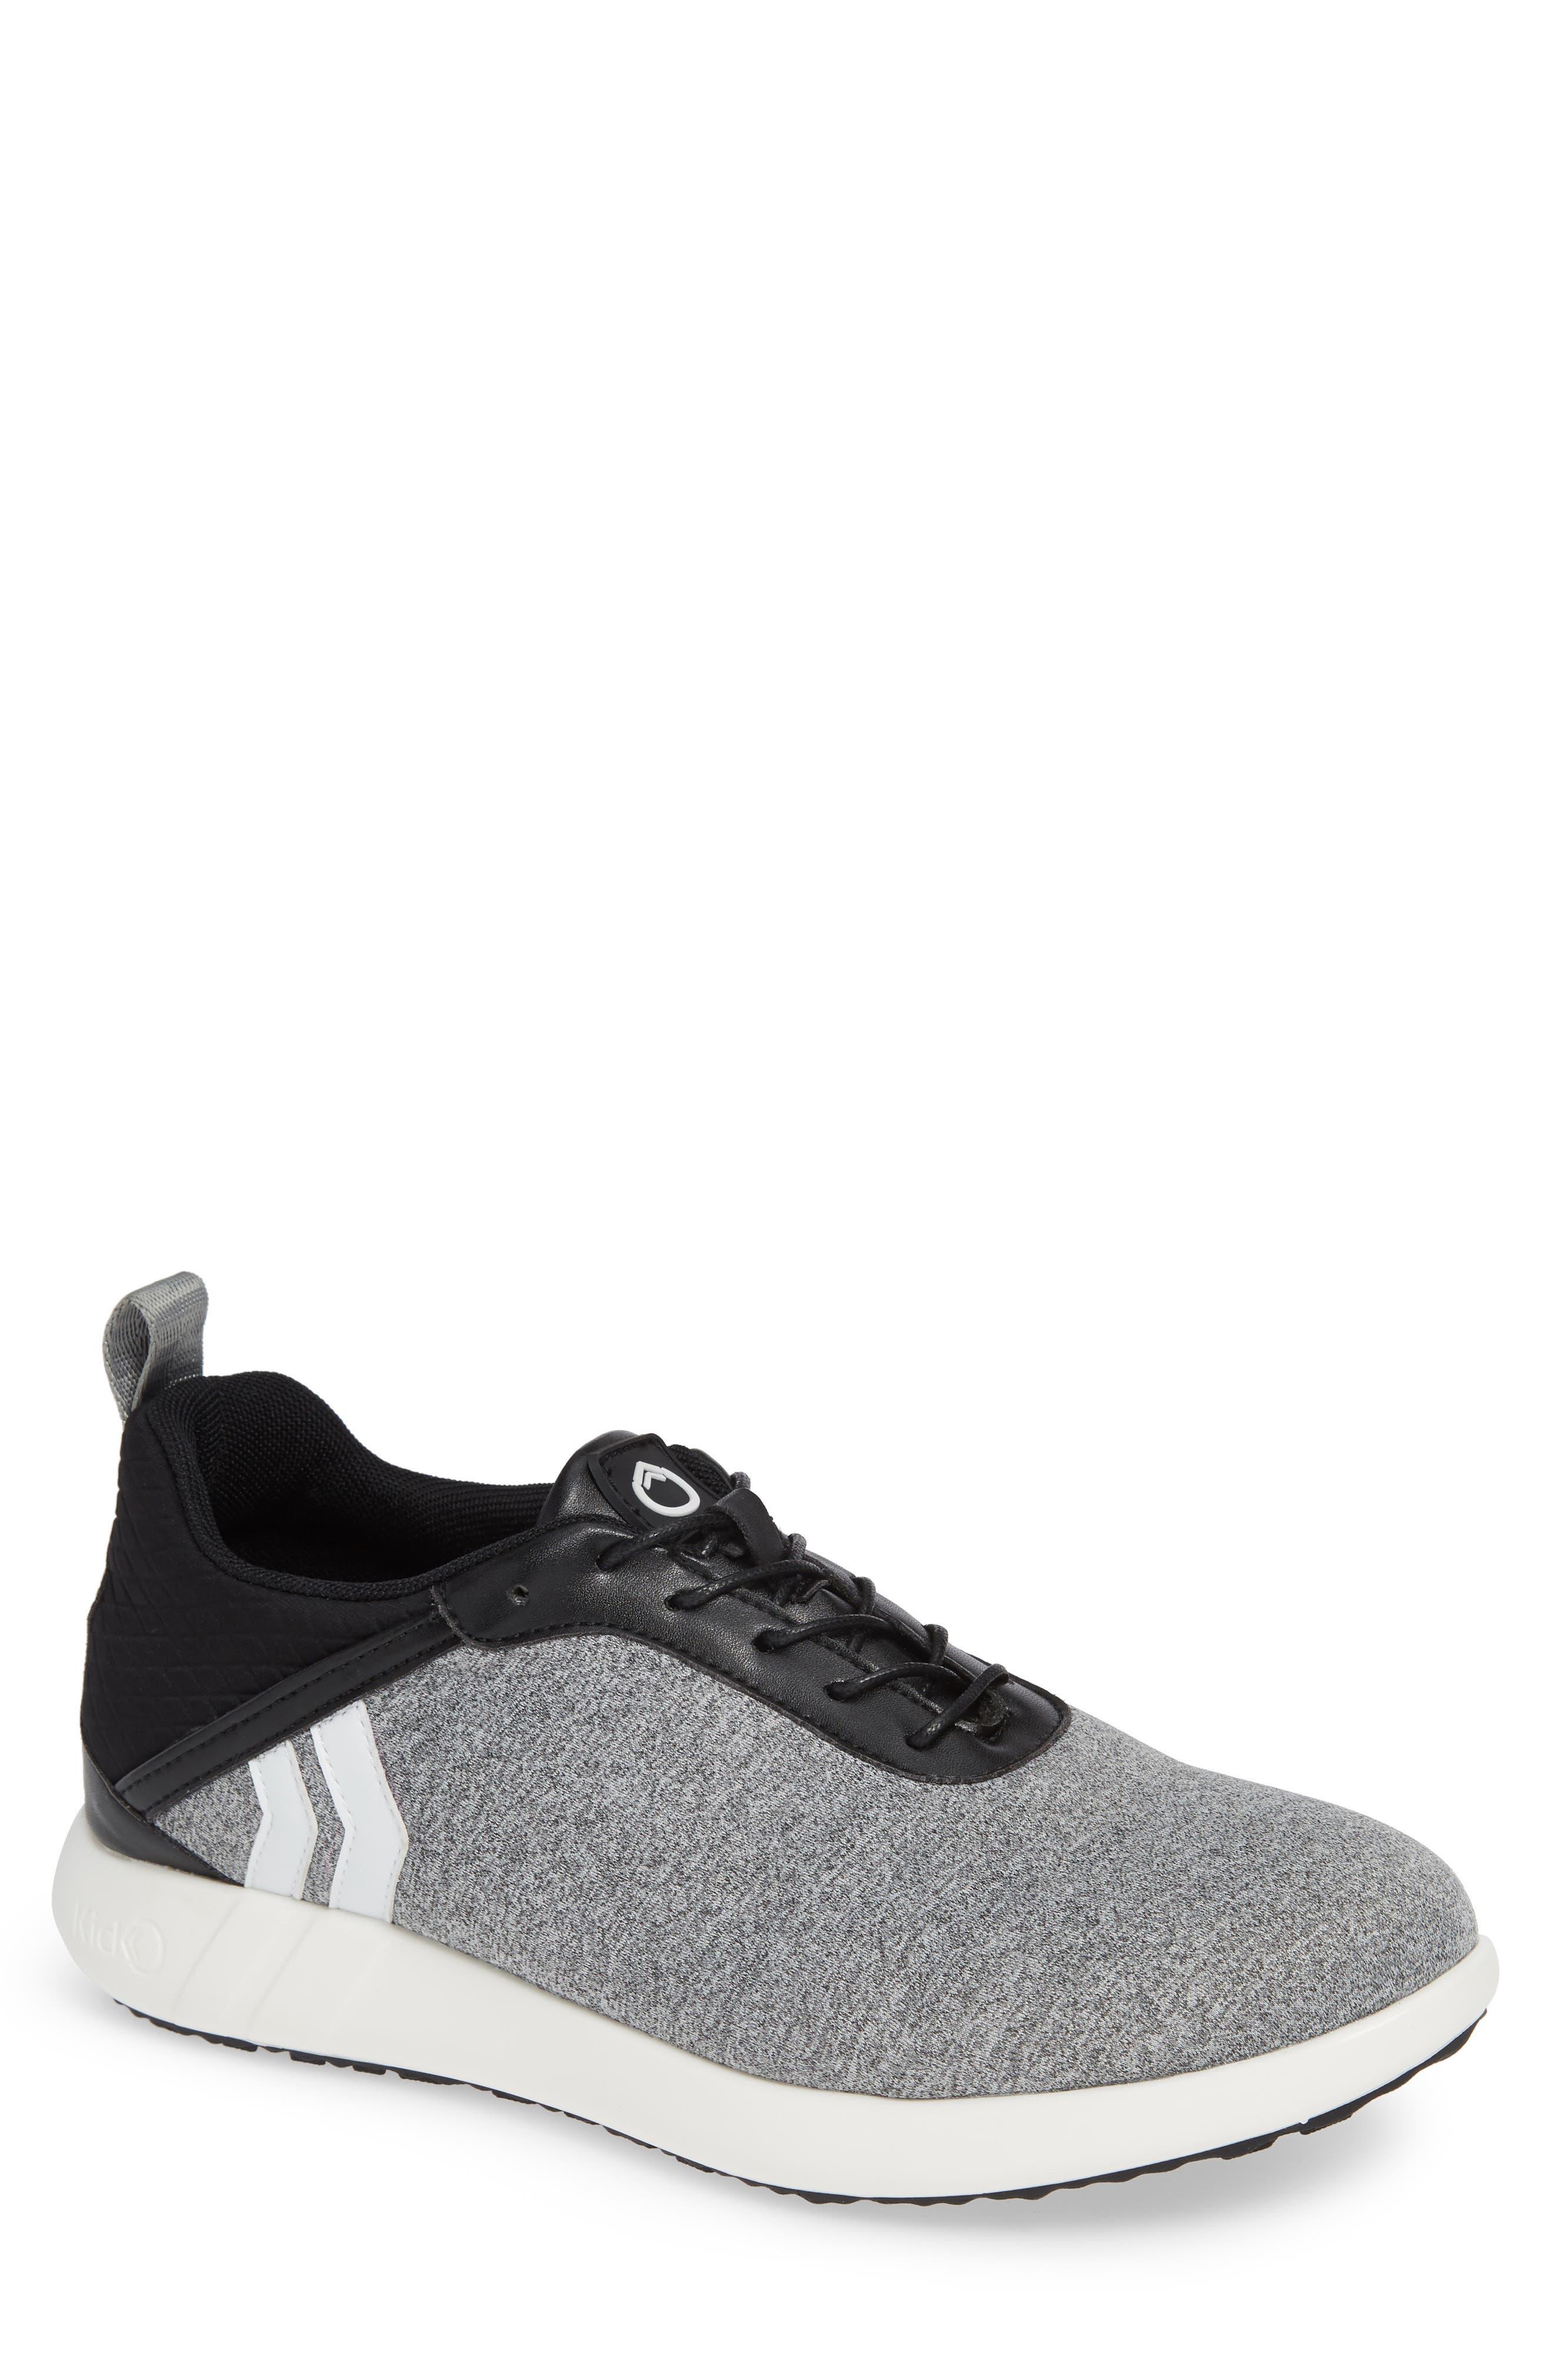 Avalon Sneaker,                         Main,                         color, GREY FABRIC